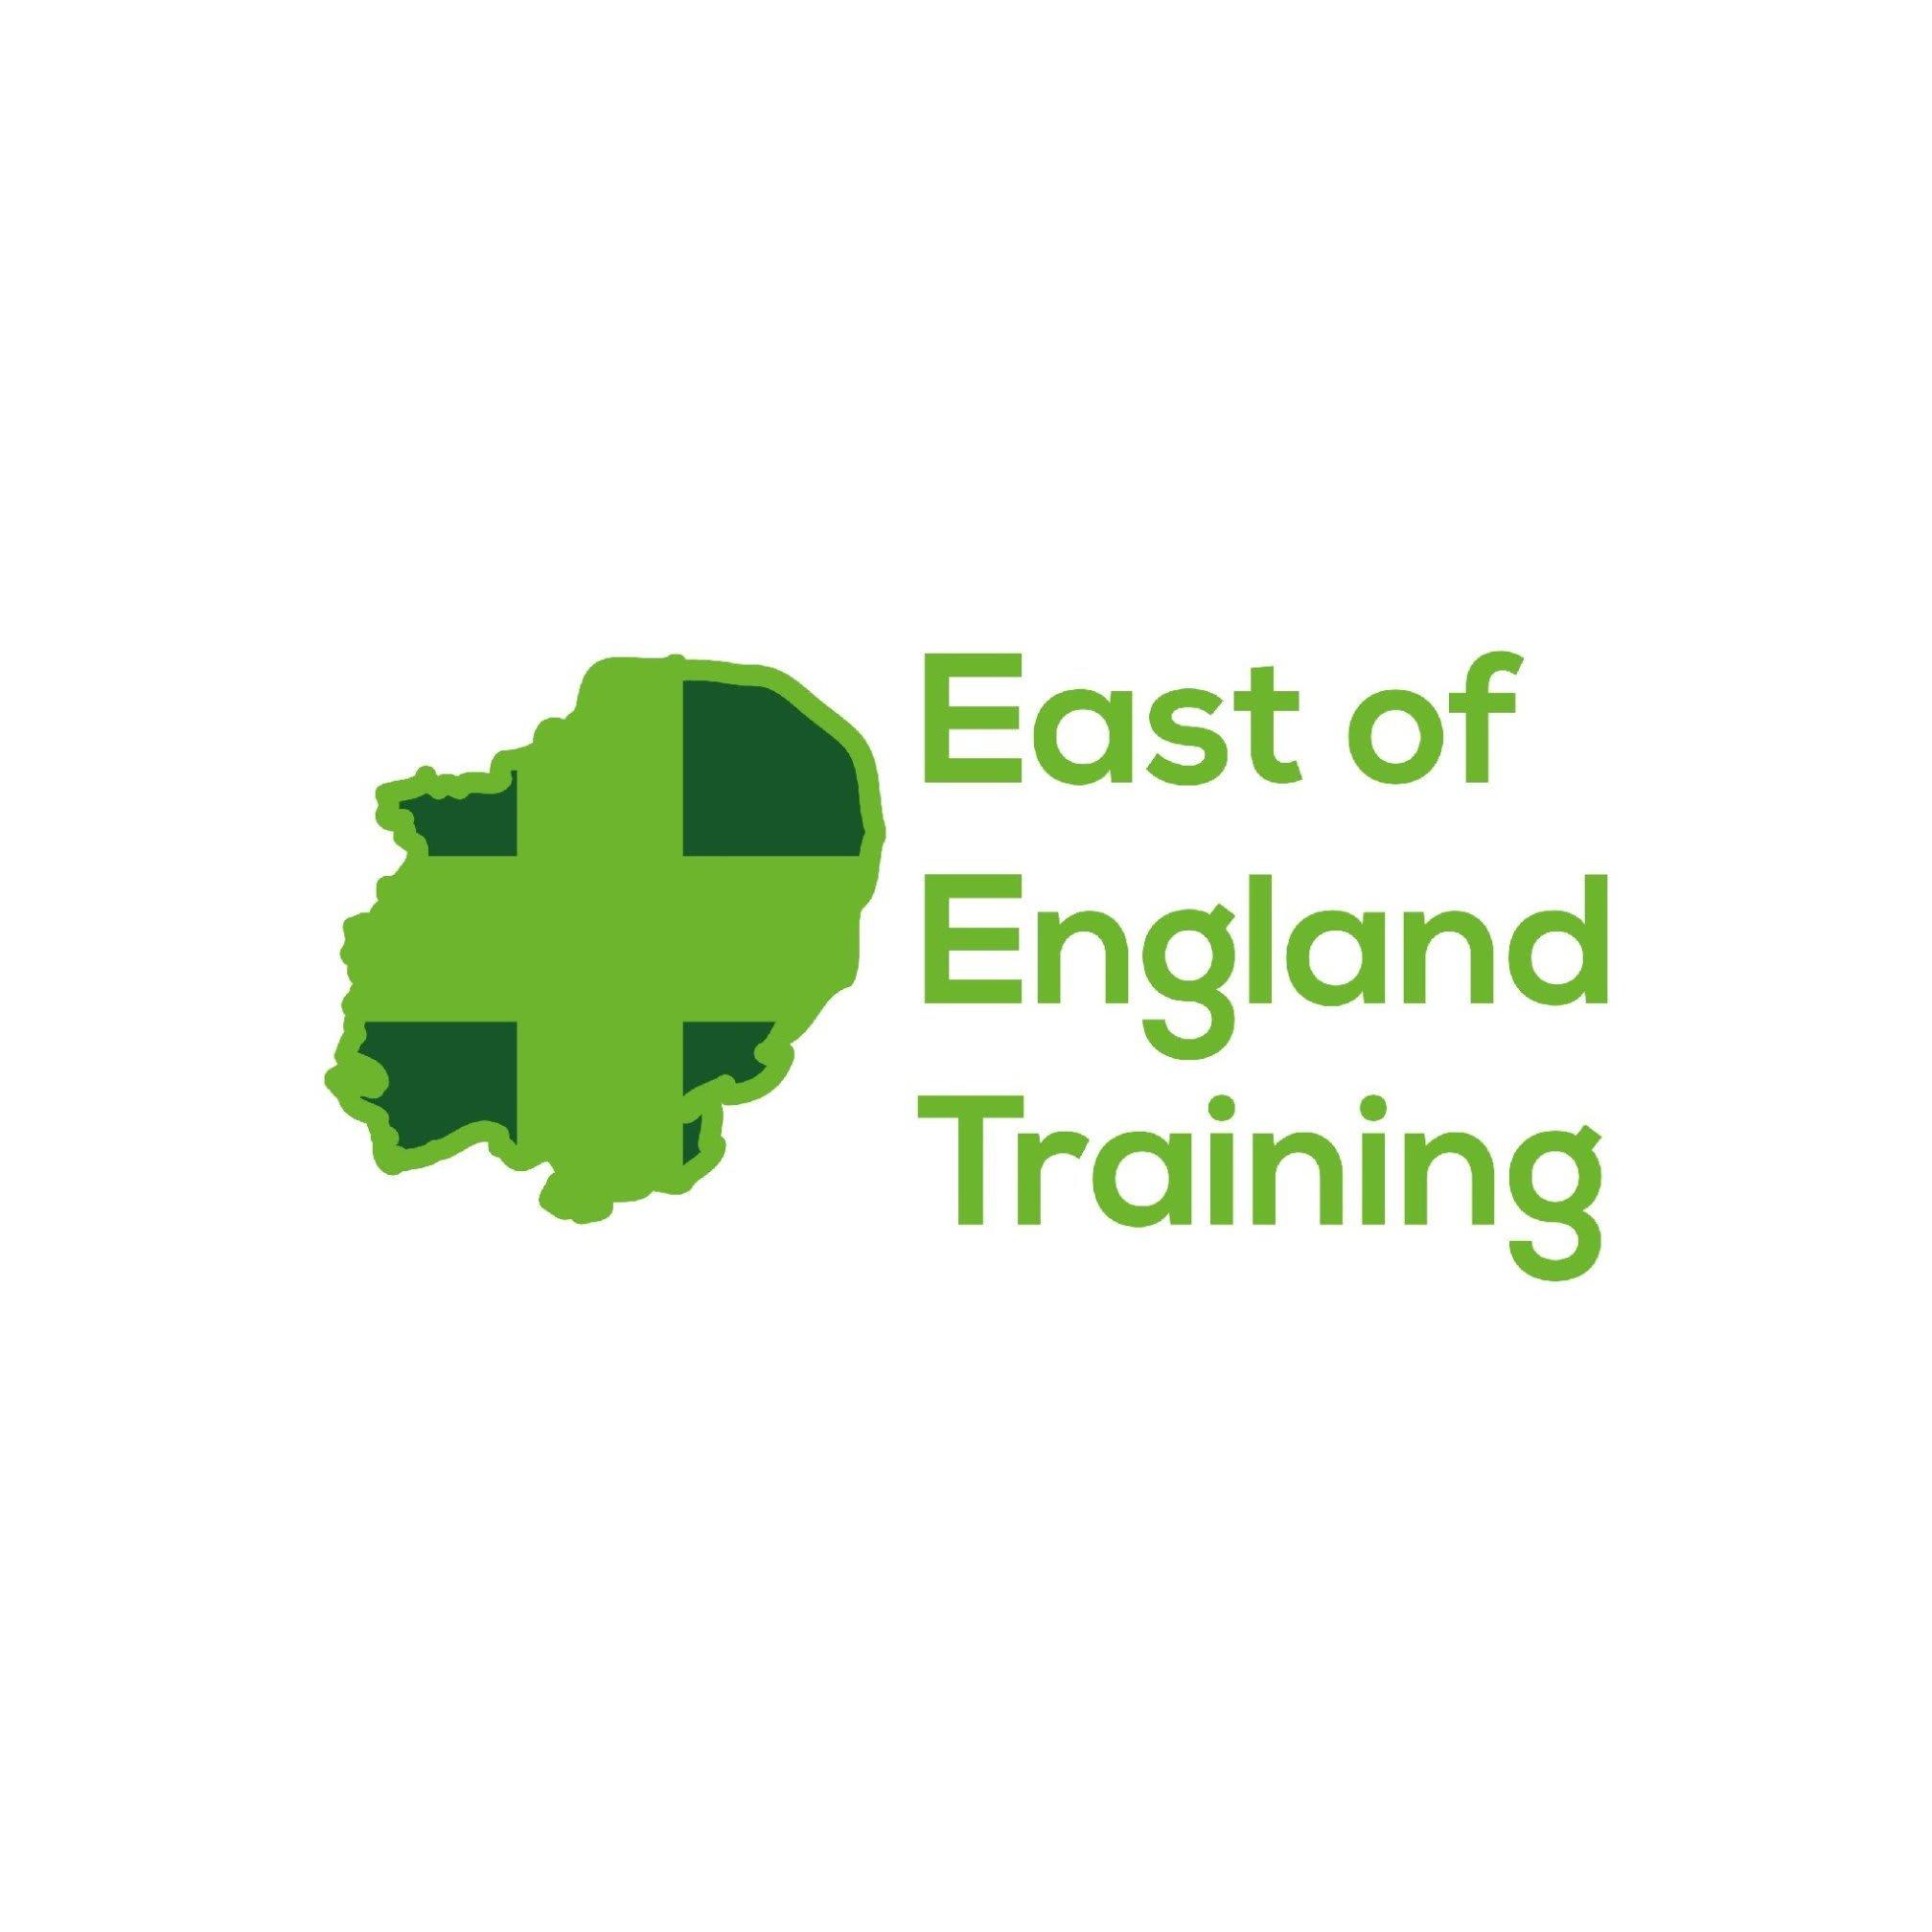 East of England Training